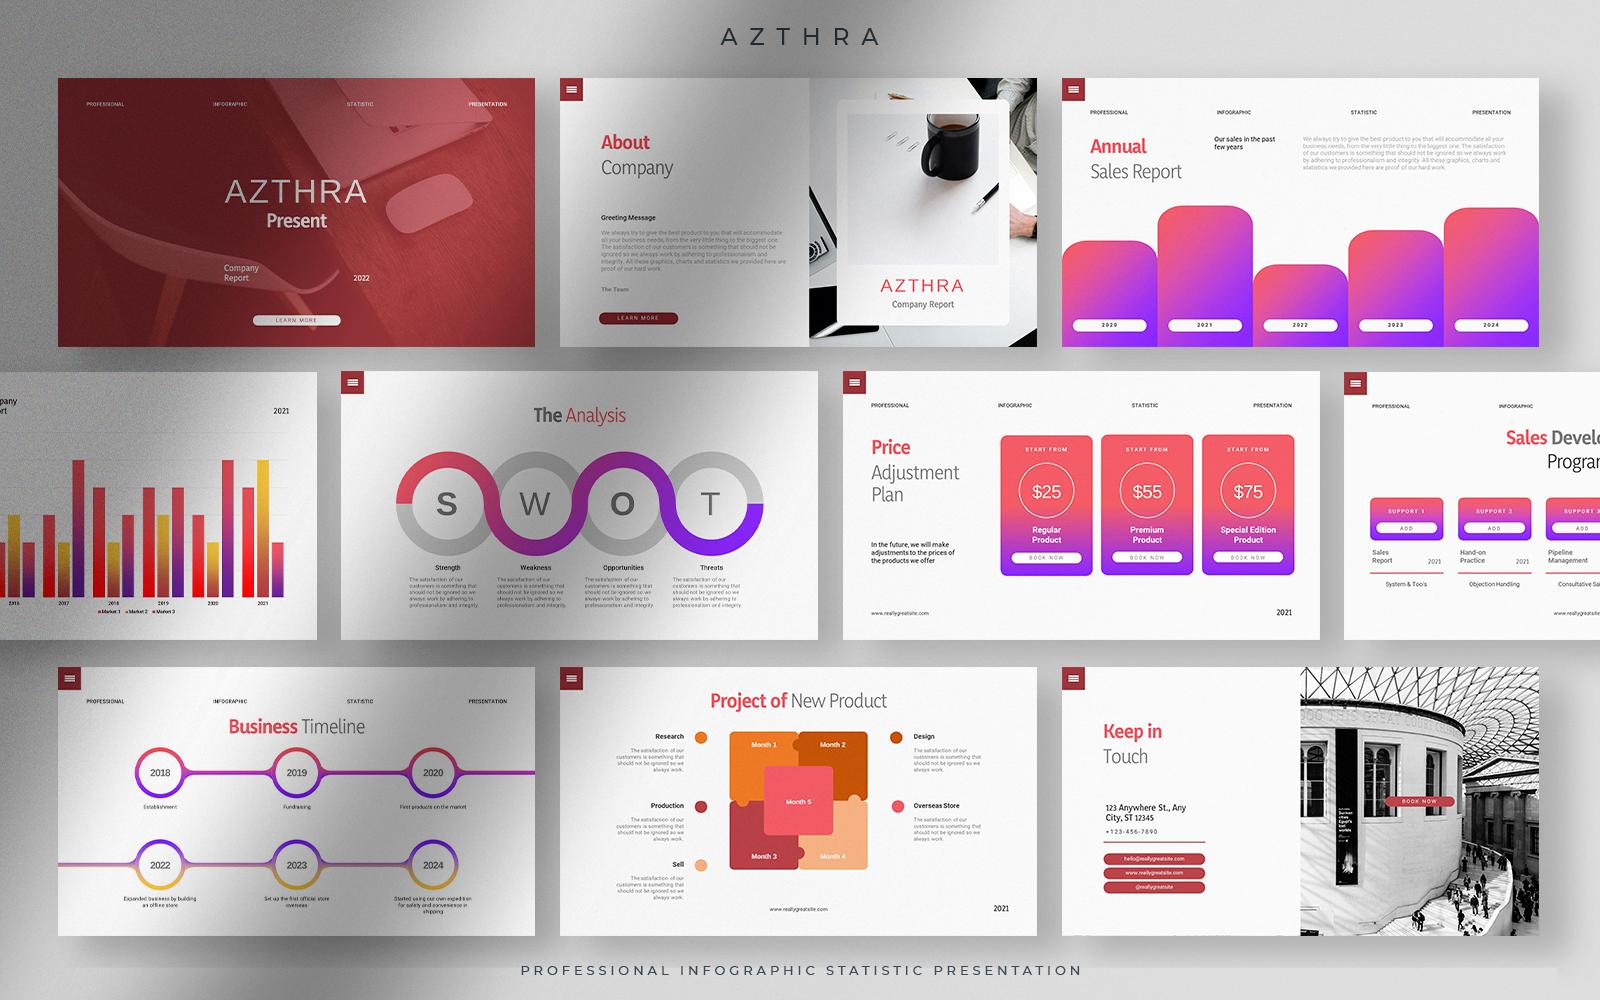 Azthra - Professional Infographic Statistic Presentation